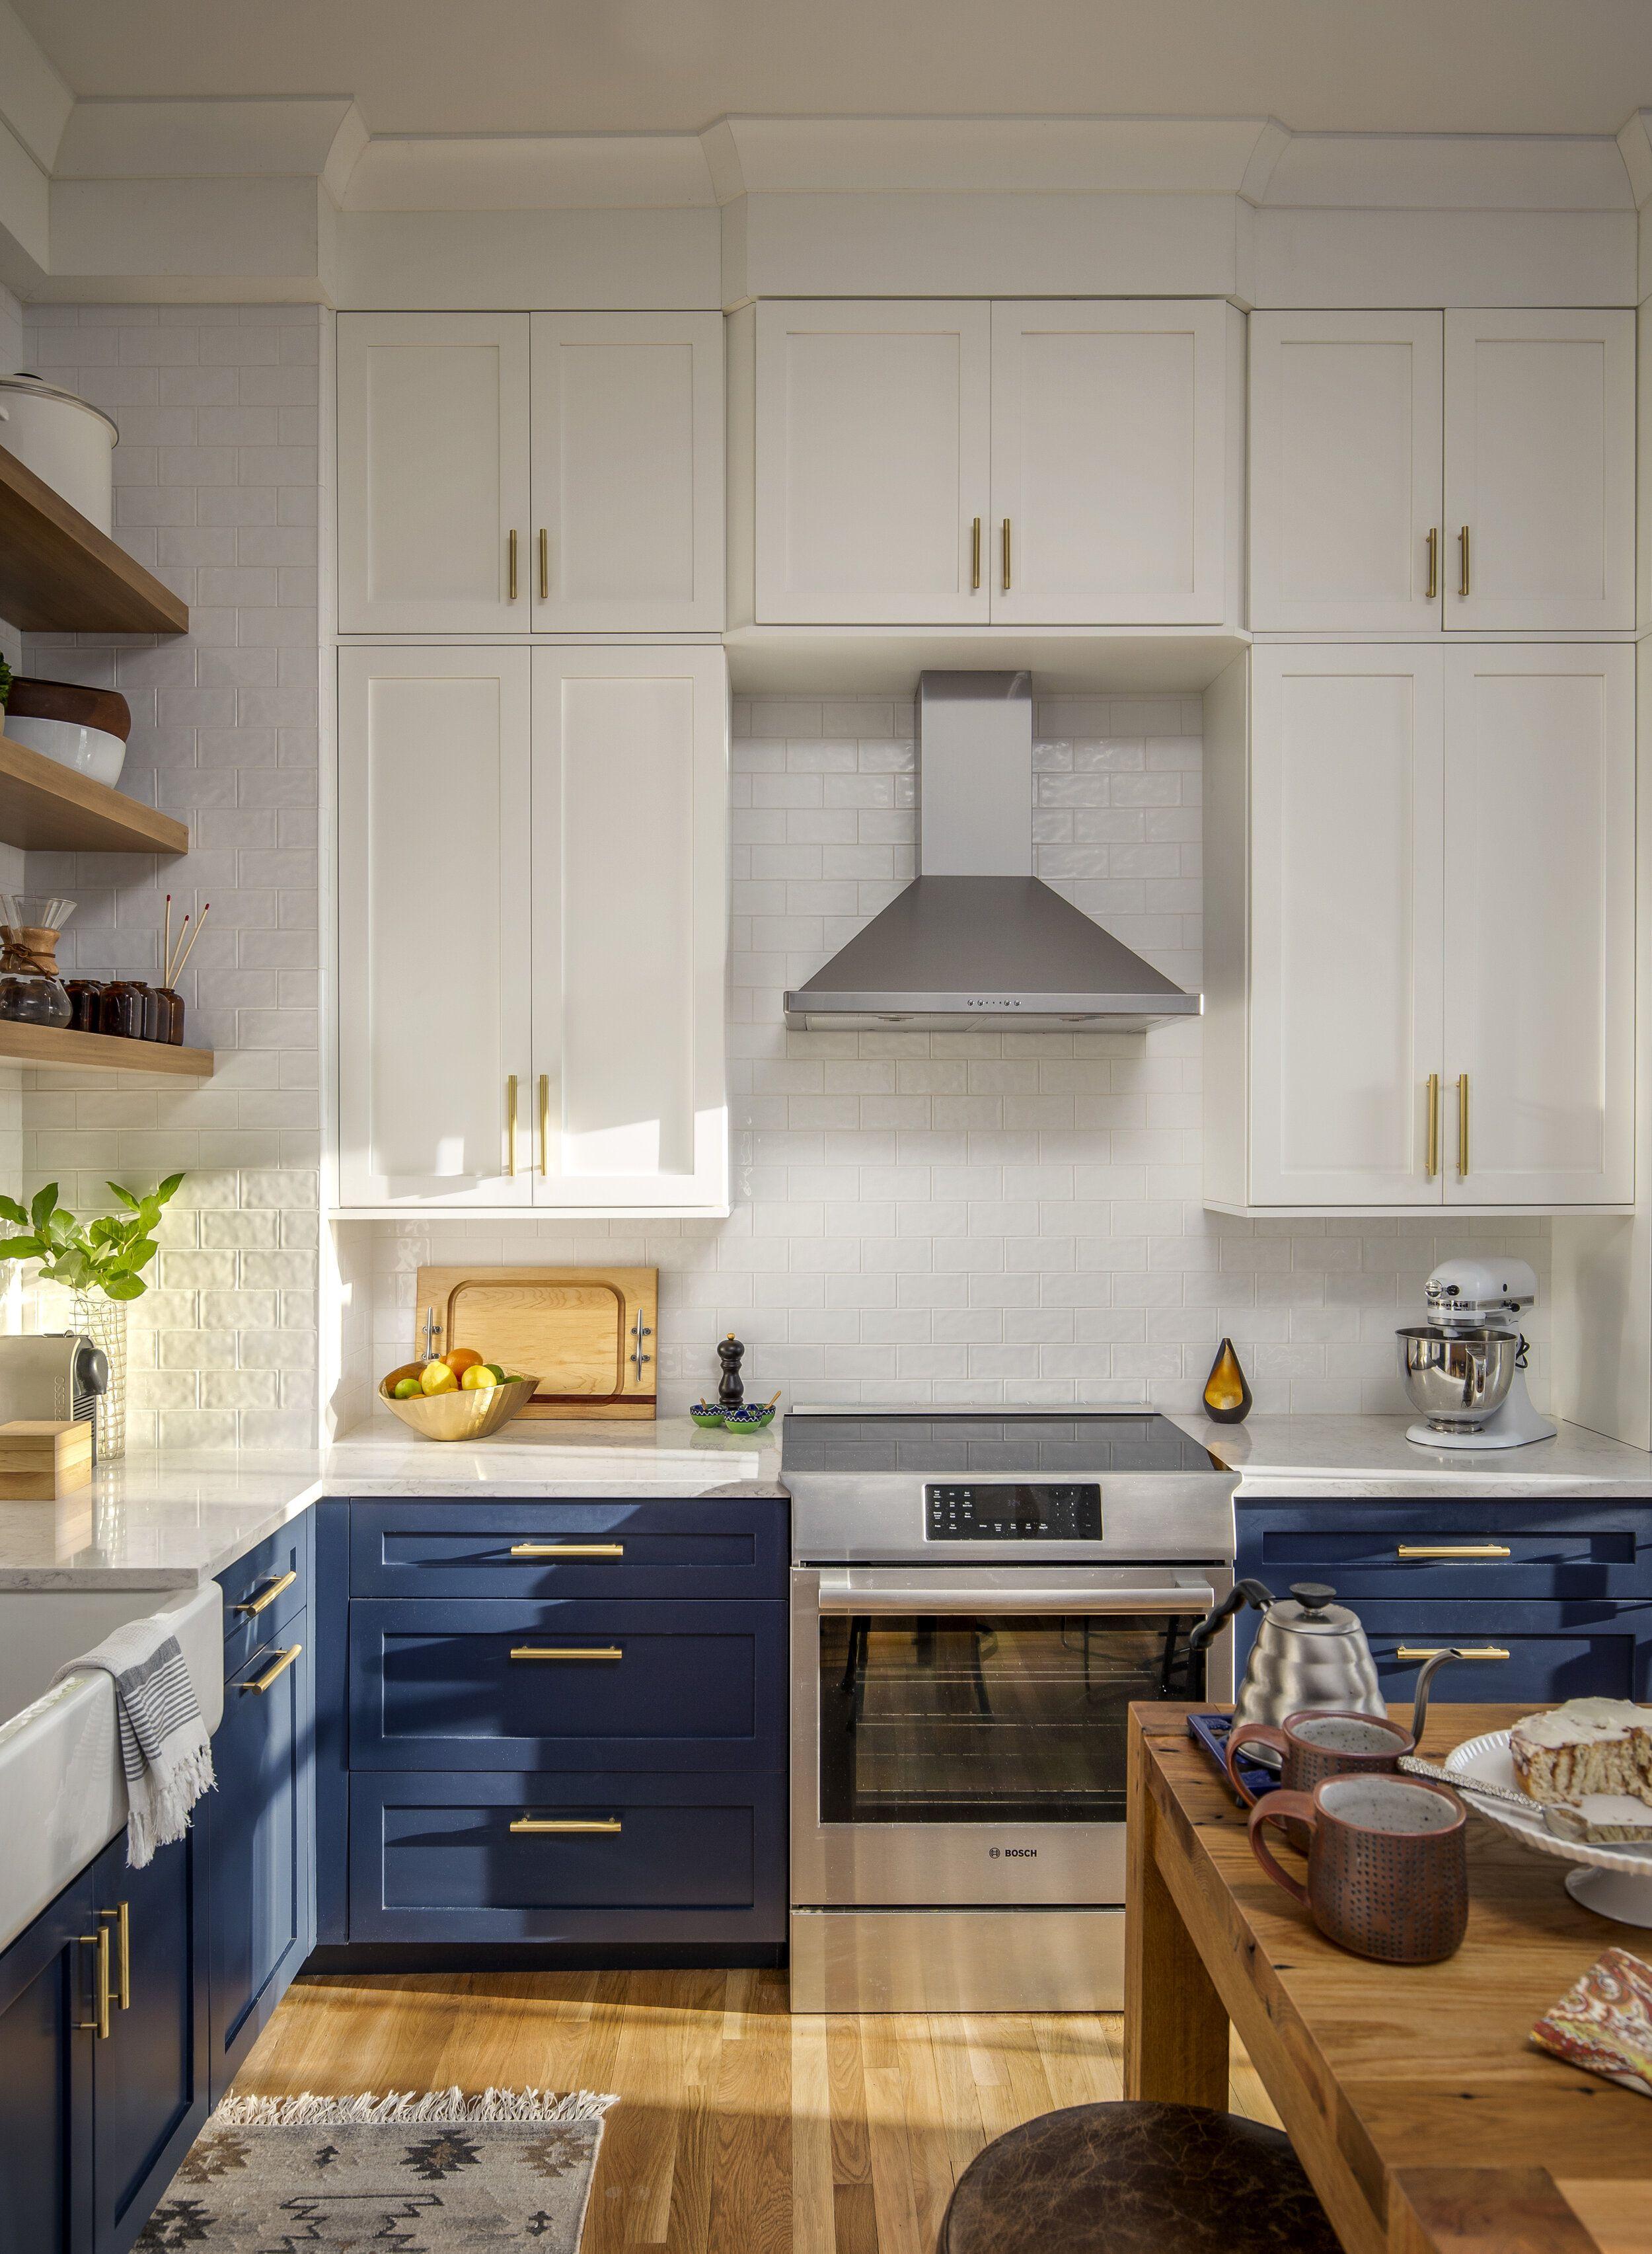 29+ South end kitchen ideas